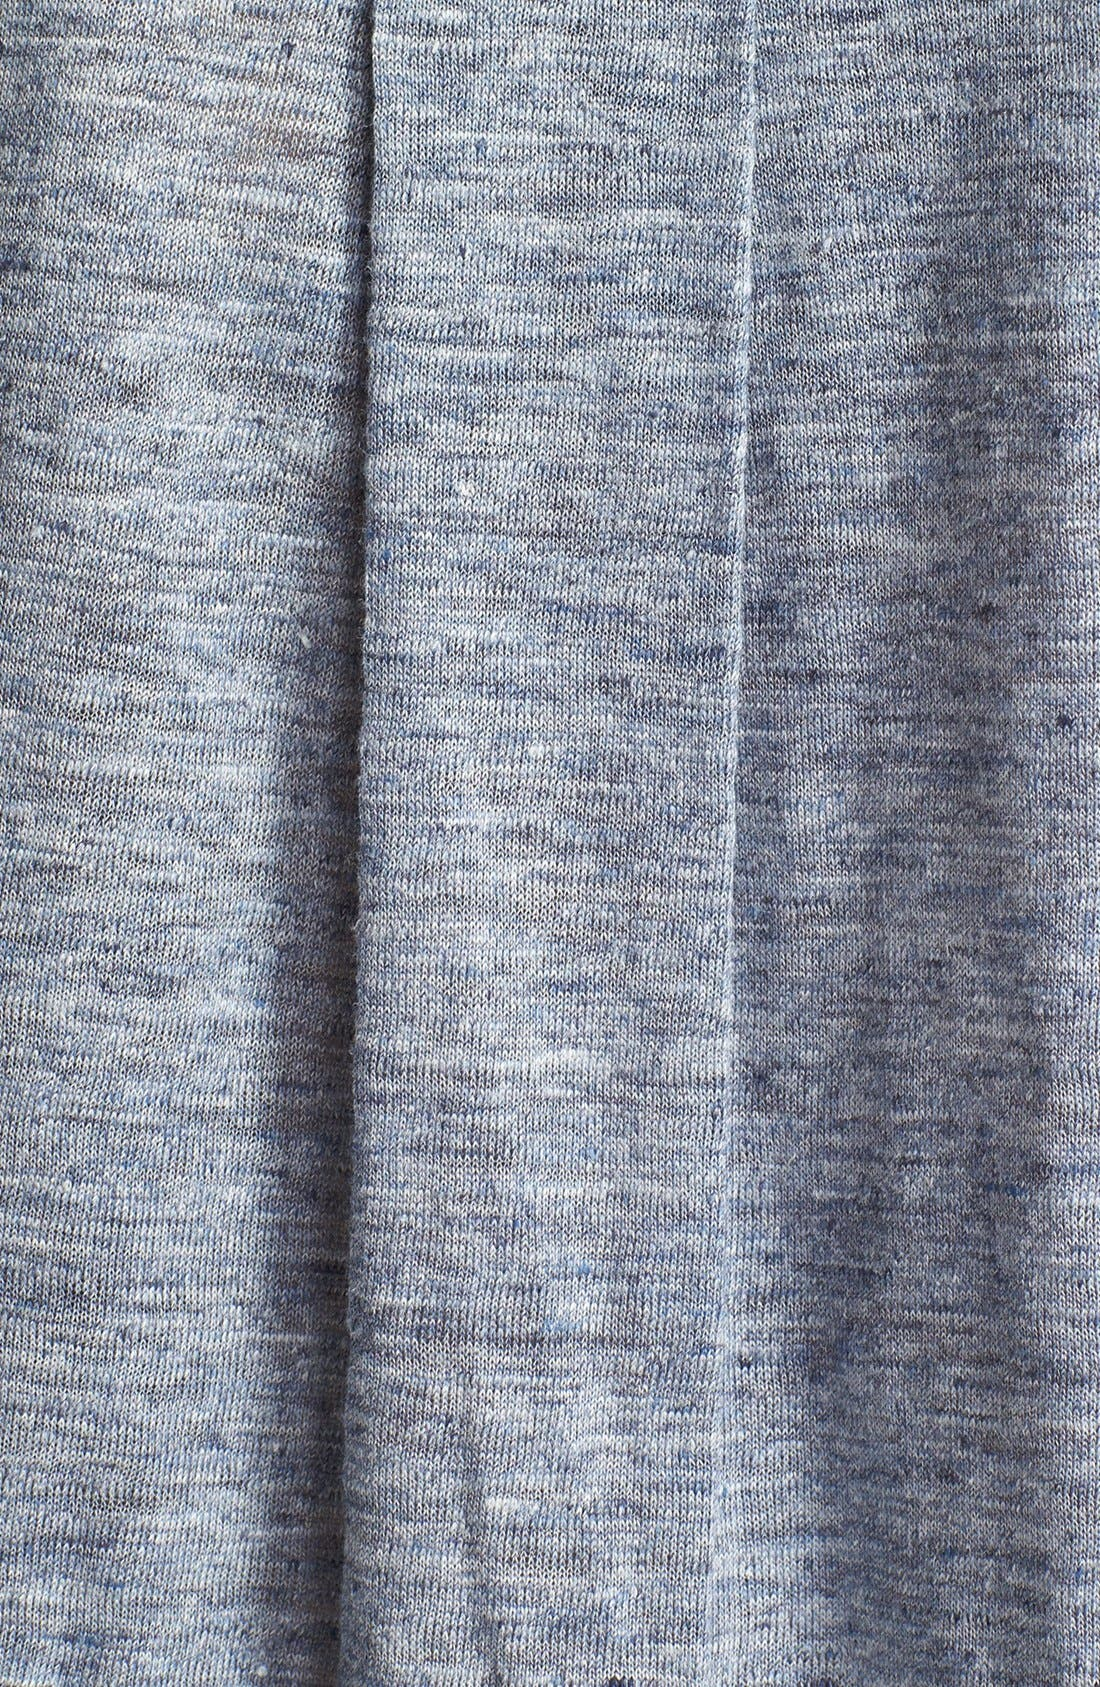 Alternate Image 3  - Vince Long Sleeve Linen Tee